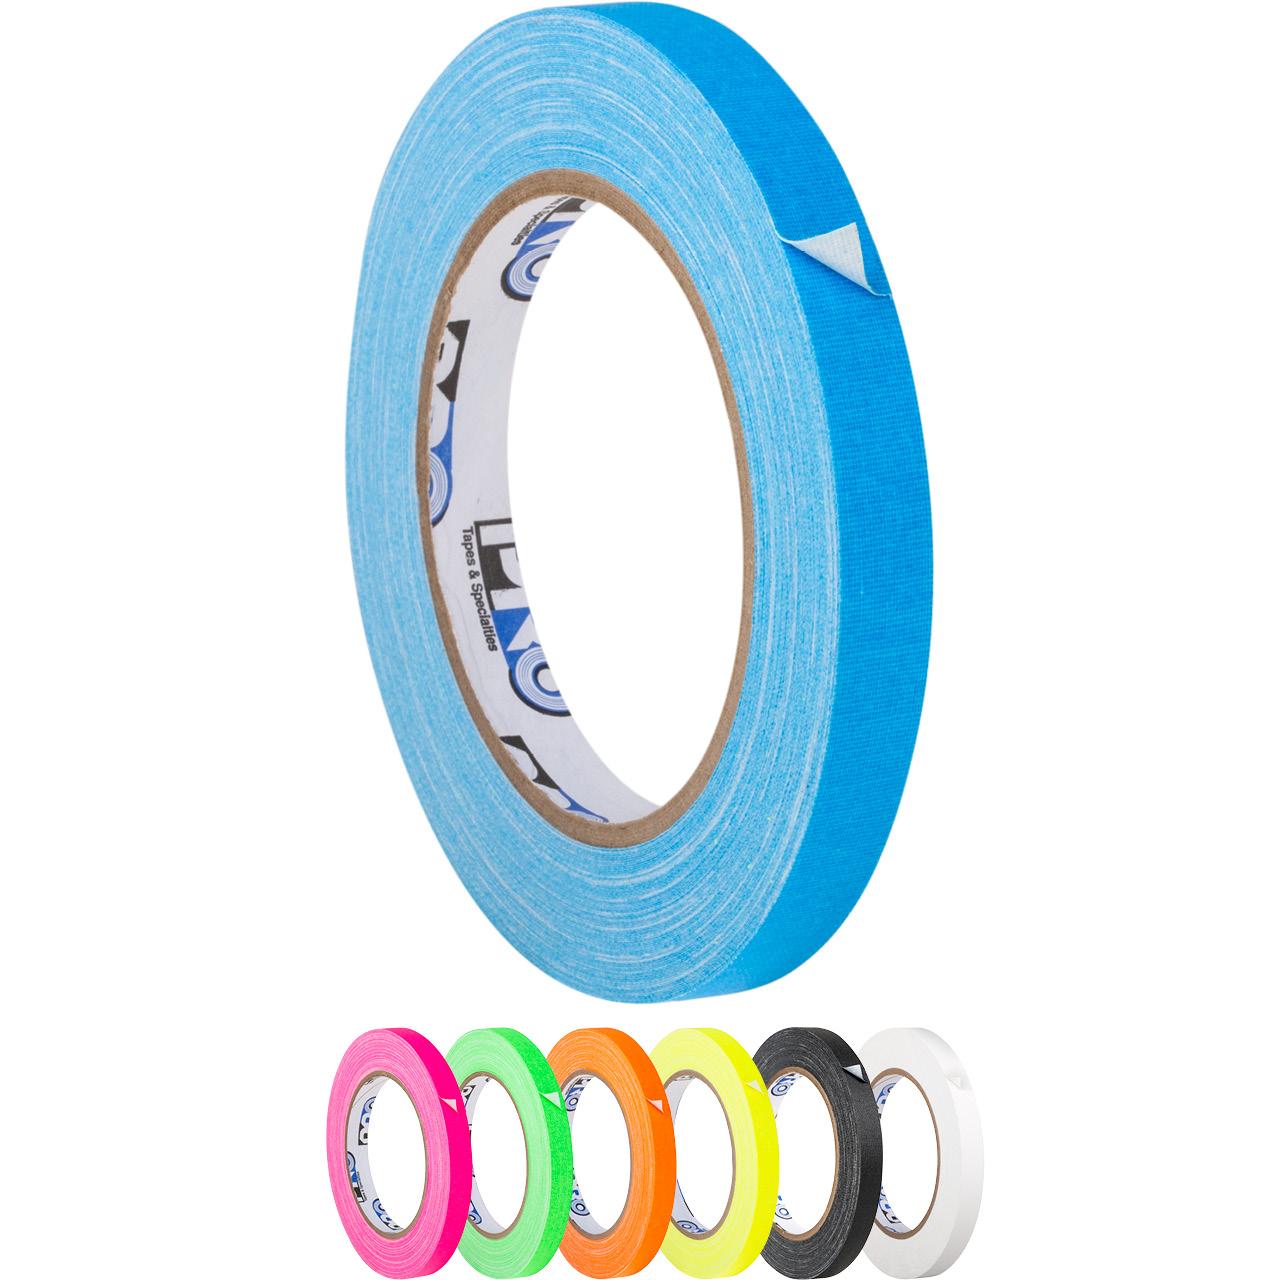 0,29€//m tesa 4671 25mm x 25m fluoreszierend neon PINK Gewebeband Warnband